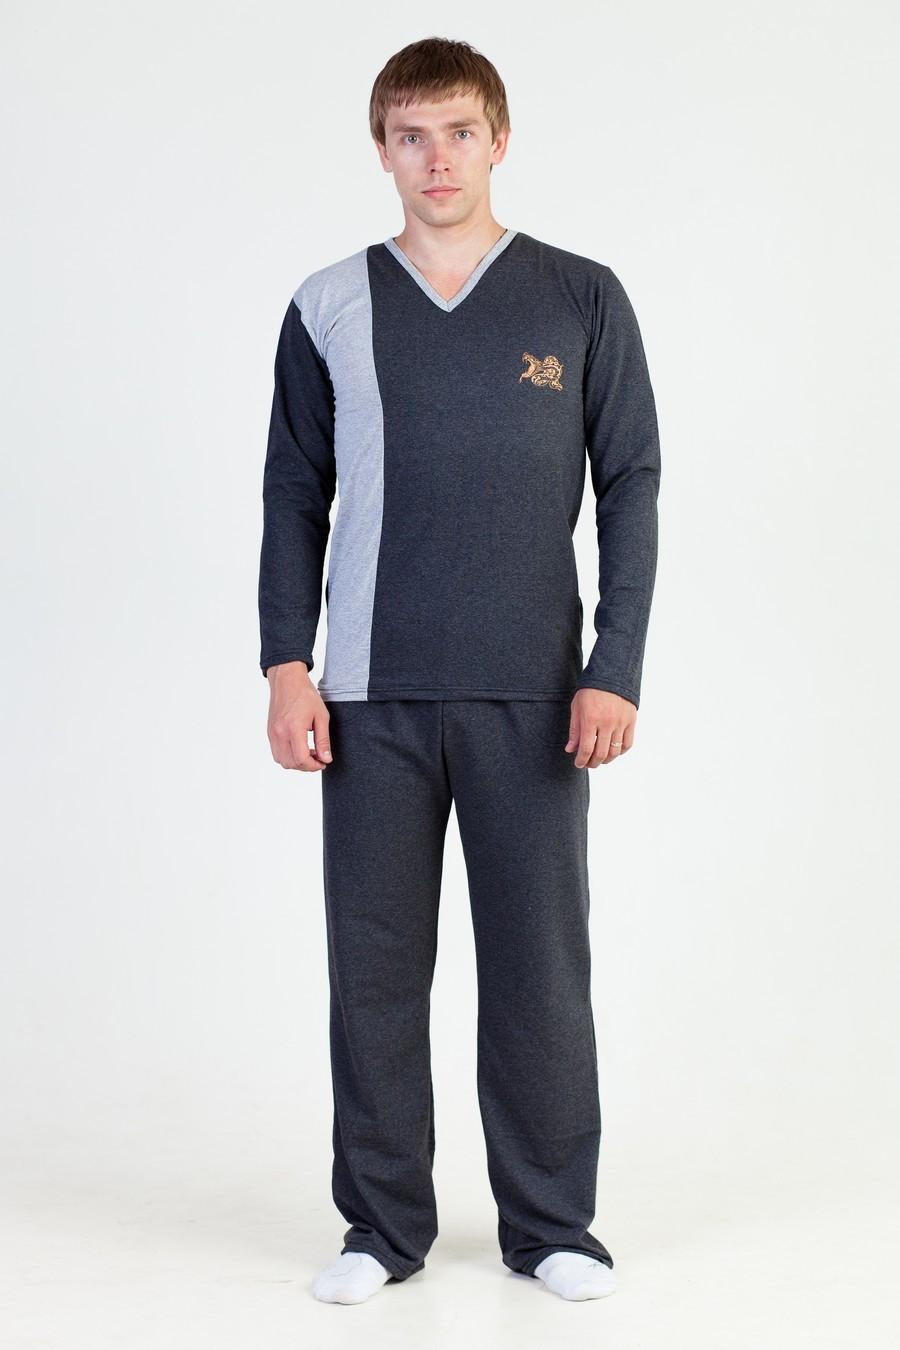 Пижама мужская Зодиак футболка и брюкиОдежда для сна<br><br><br>Размер: 48